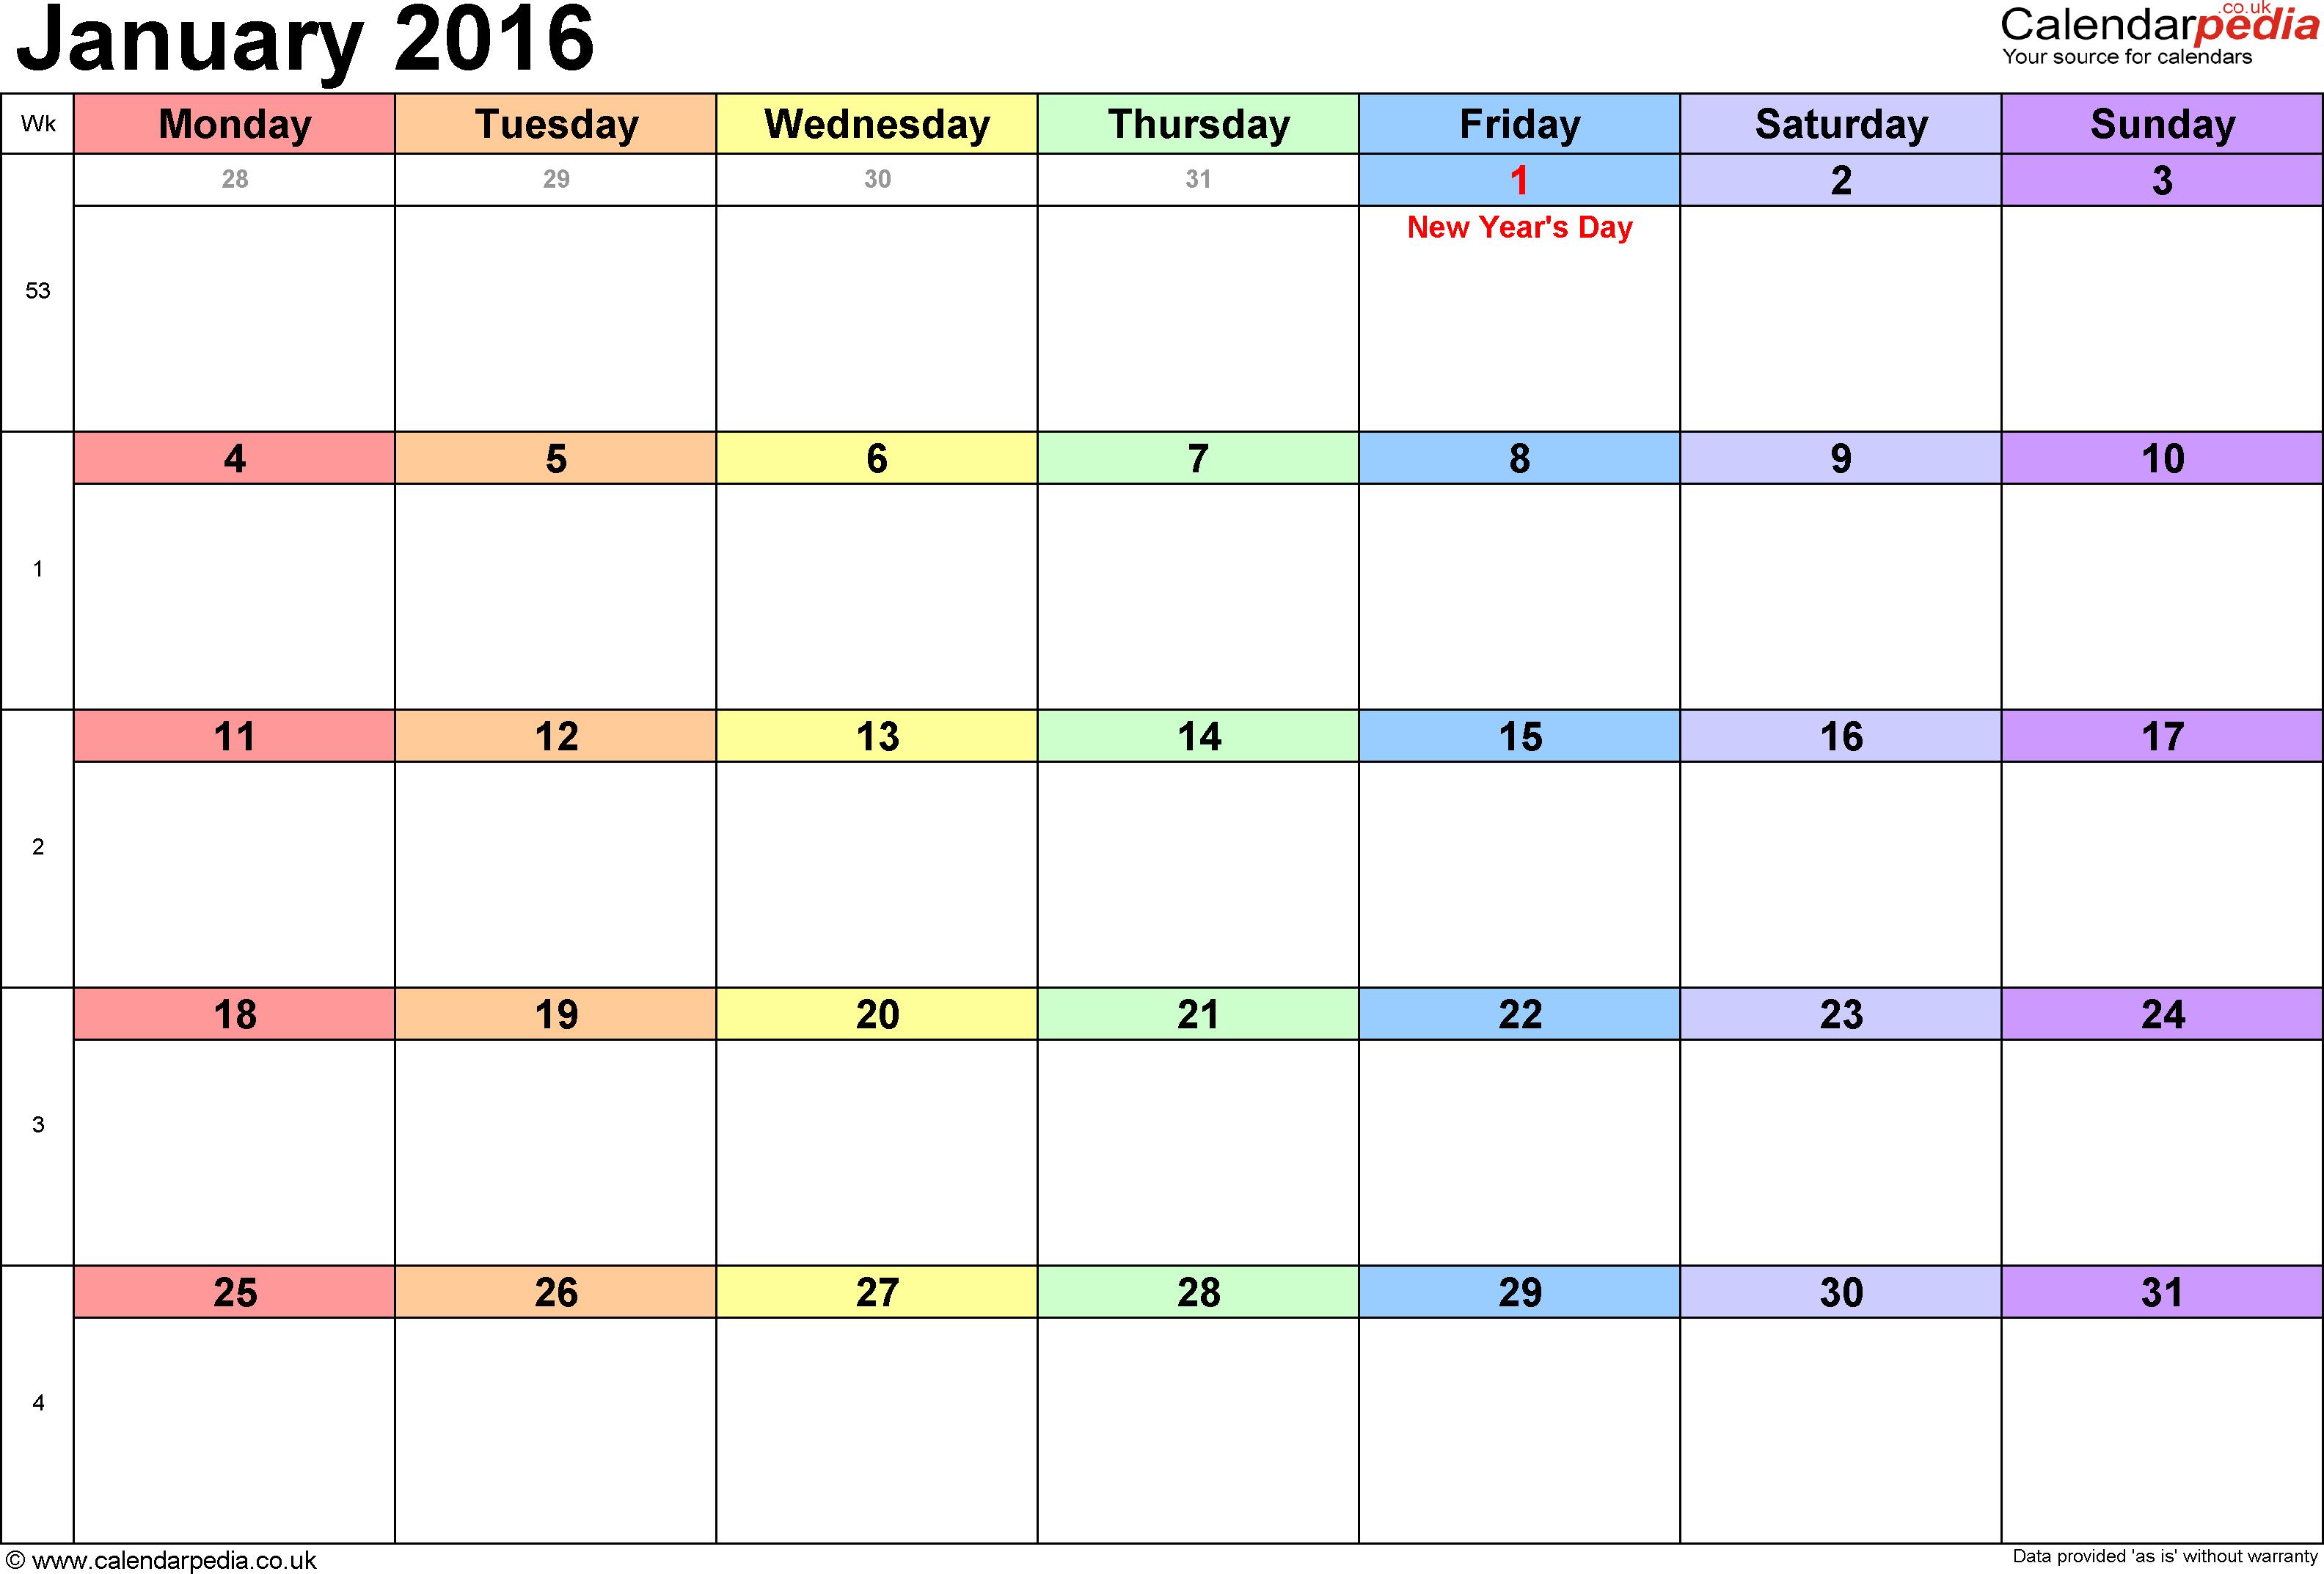 January 2016 Calendar Holidays